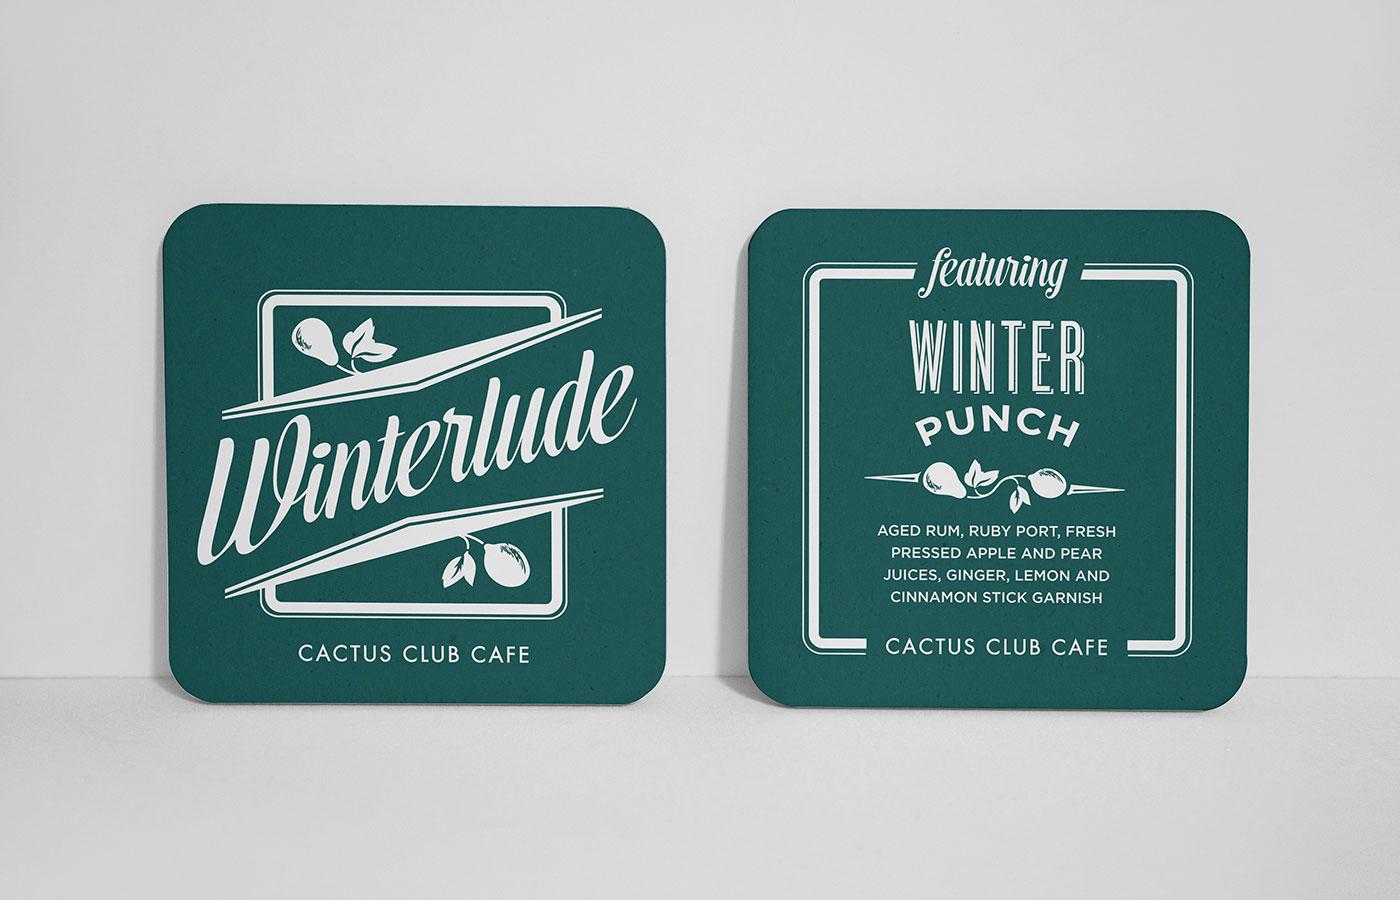 covetdesign_logo-design_branding_package-design_graphic-designer_vancouver_work_wide_cactus1